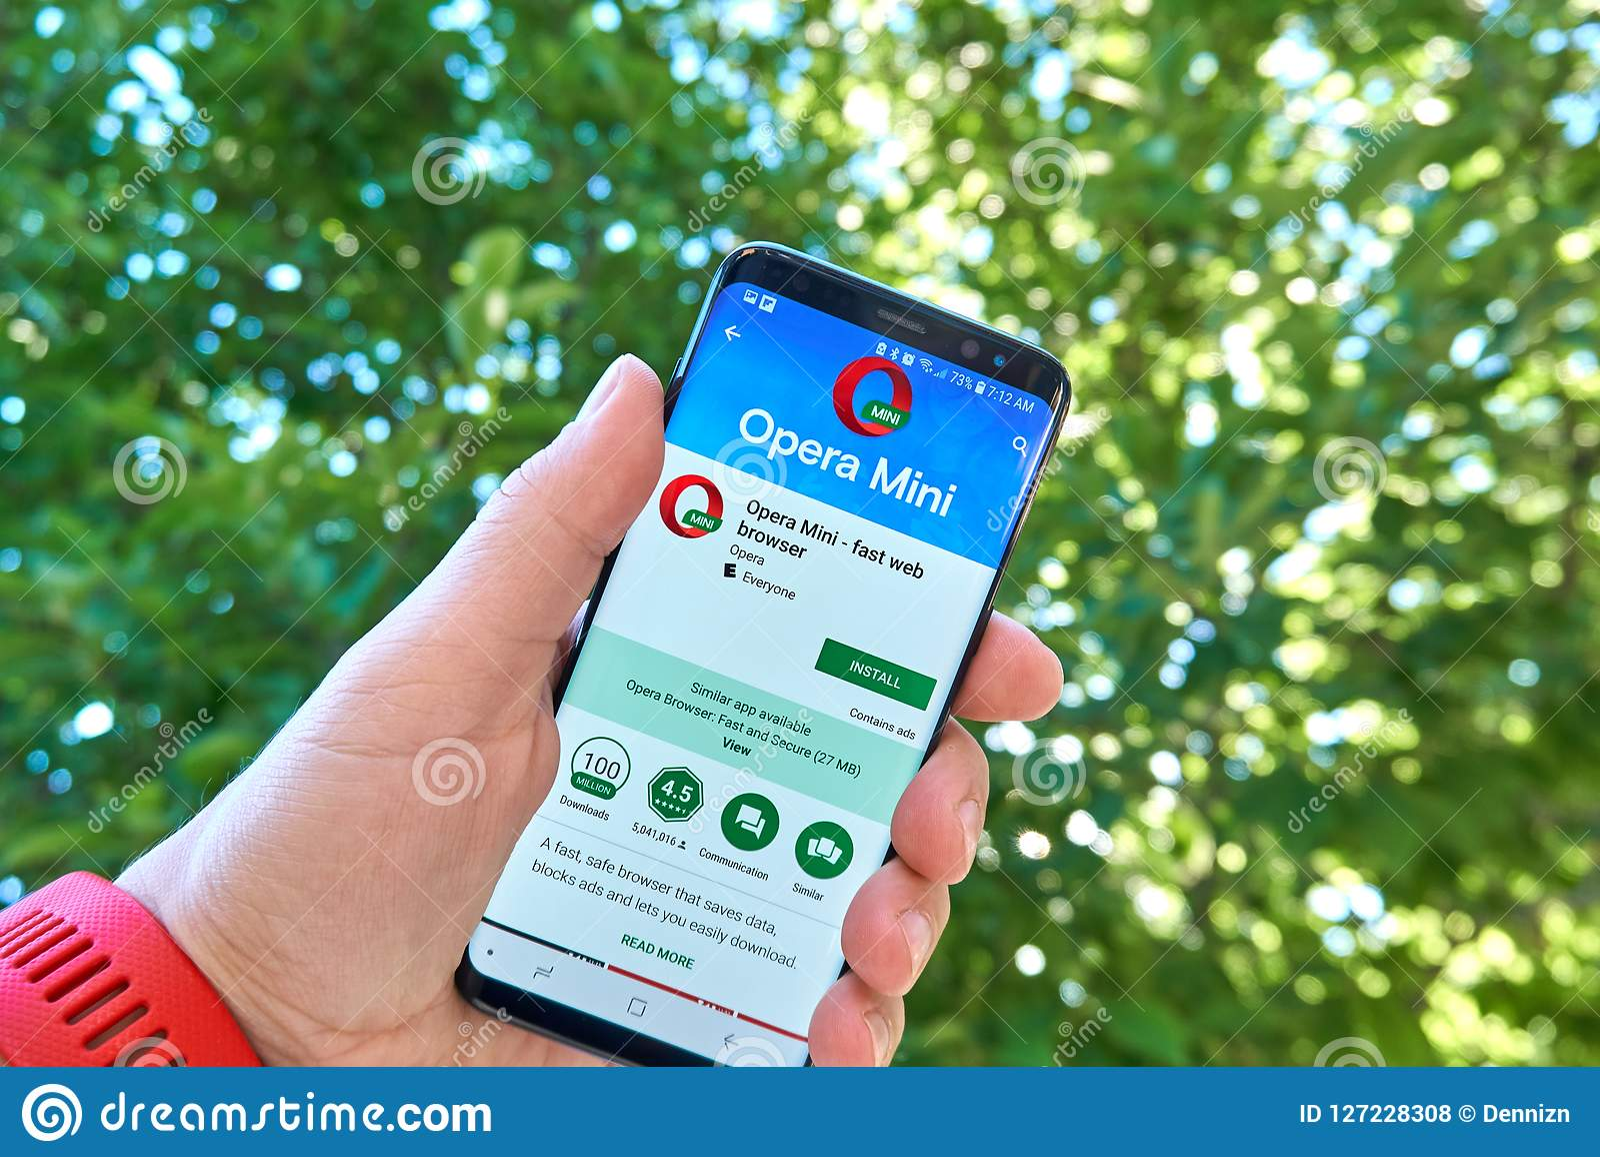 download opera mini 2018 android